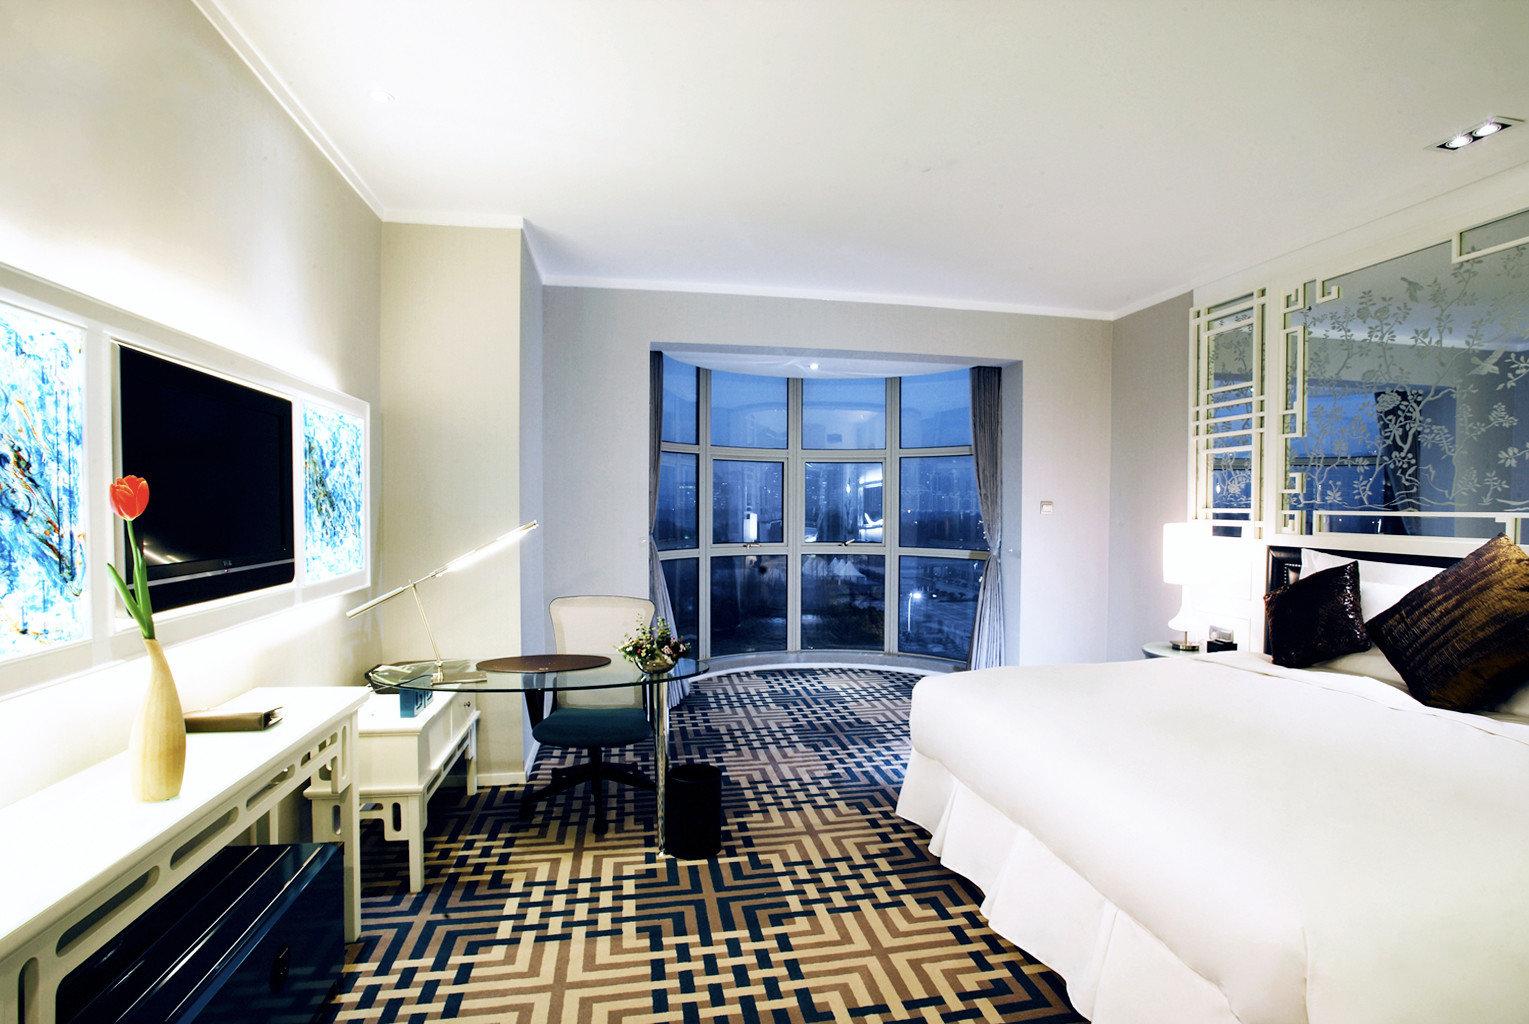 Bedroom City Elegant Luxury Scenic views Suite property condominium living room home mansion